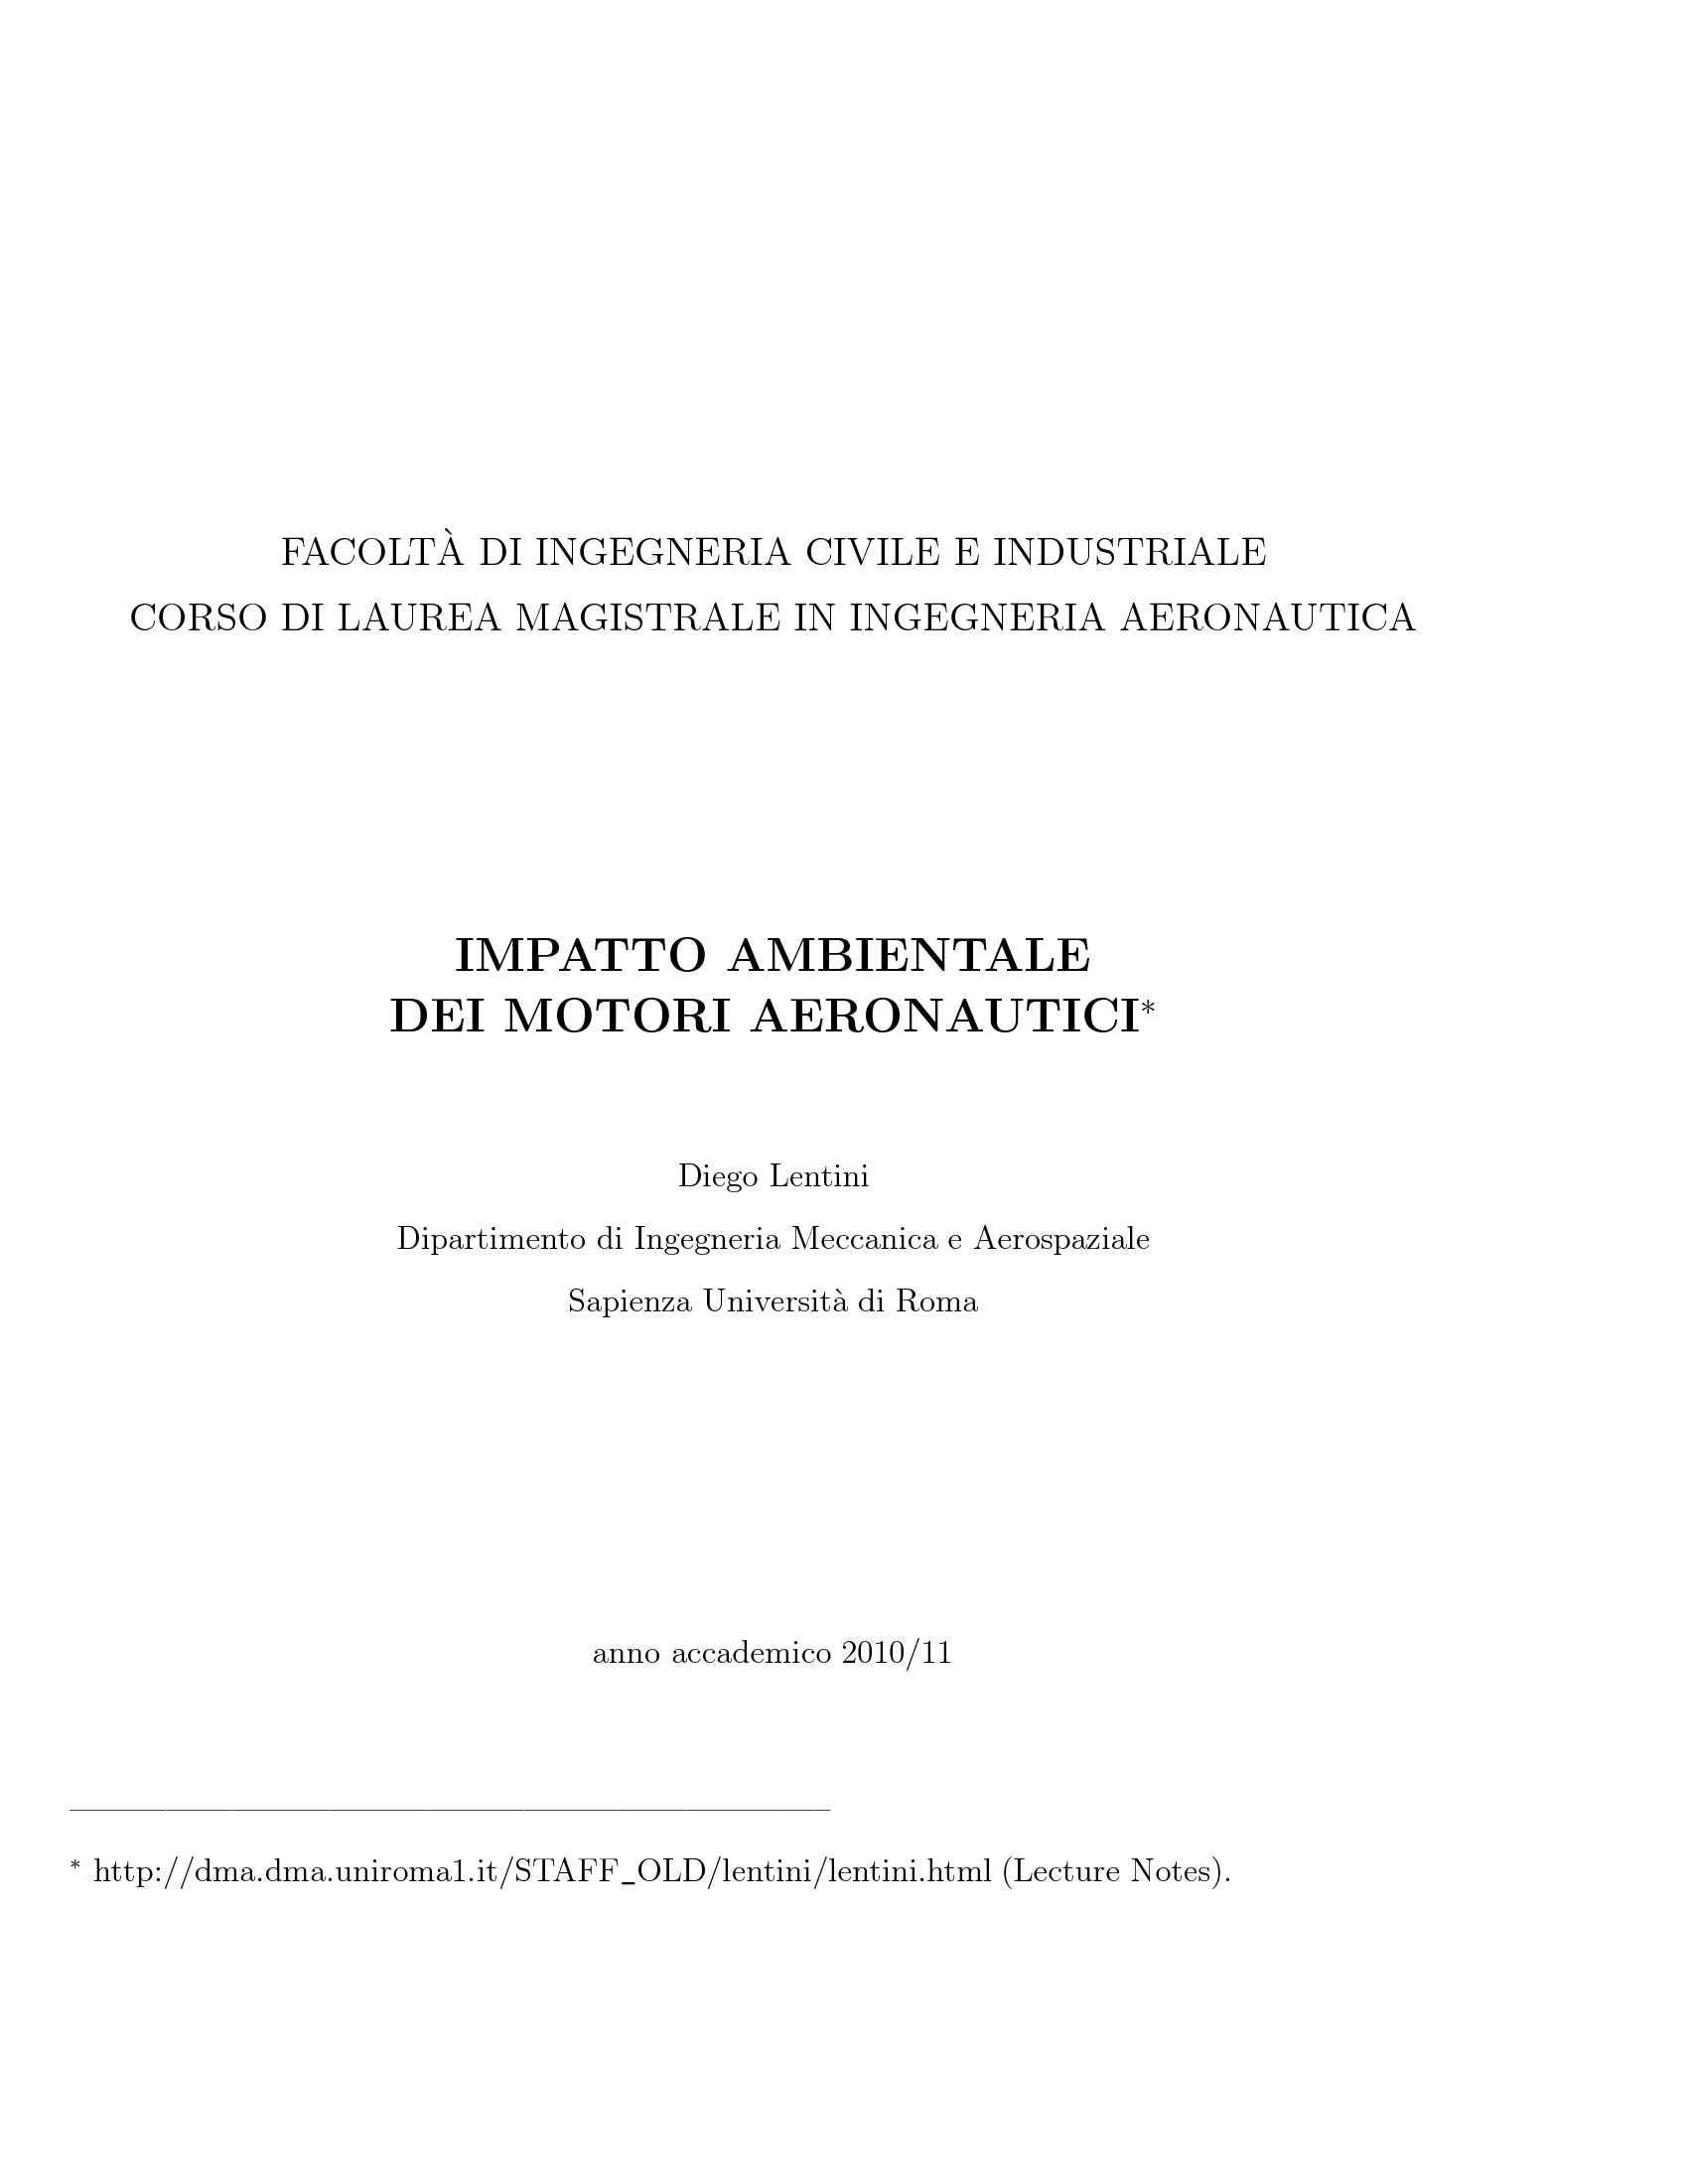 dispensa D. Lentini Impatto Ambientale dei Motori Aeronautici